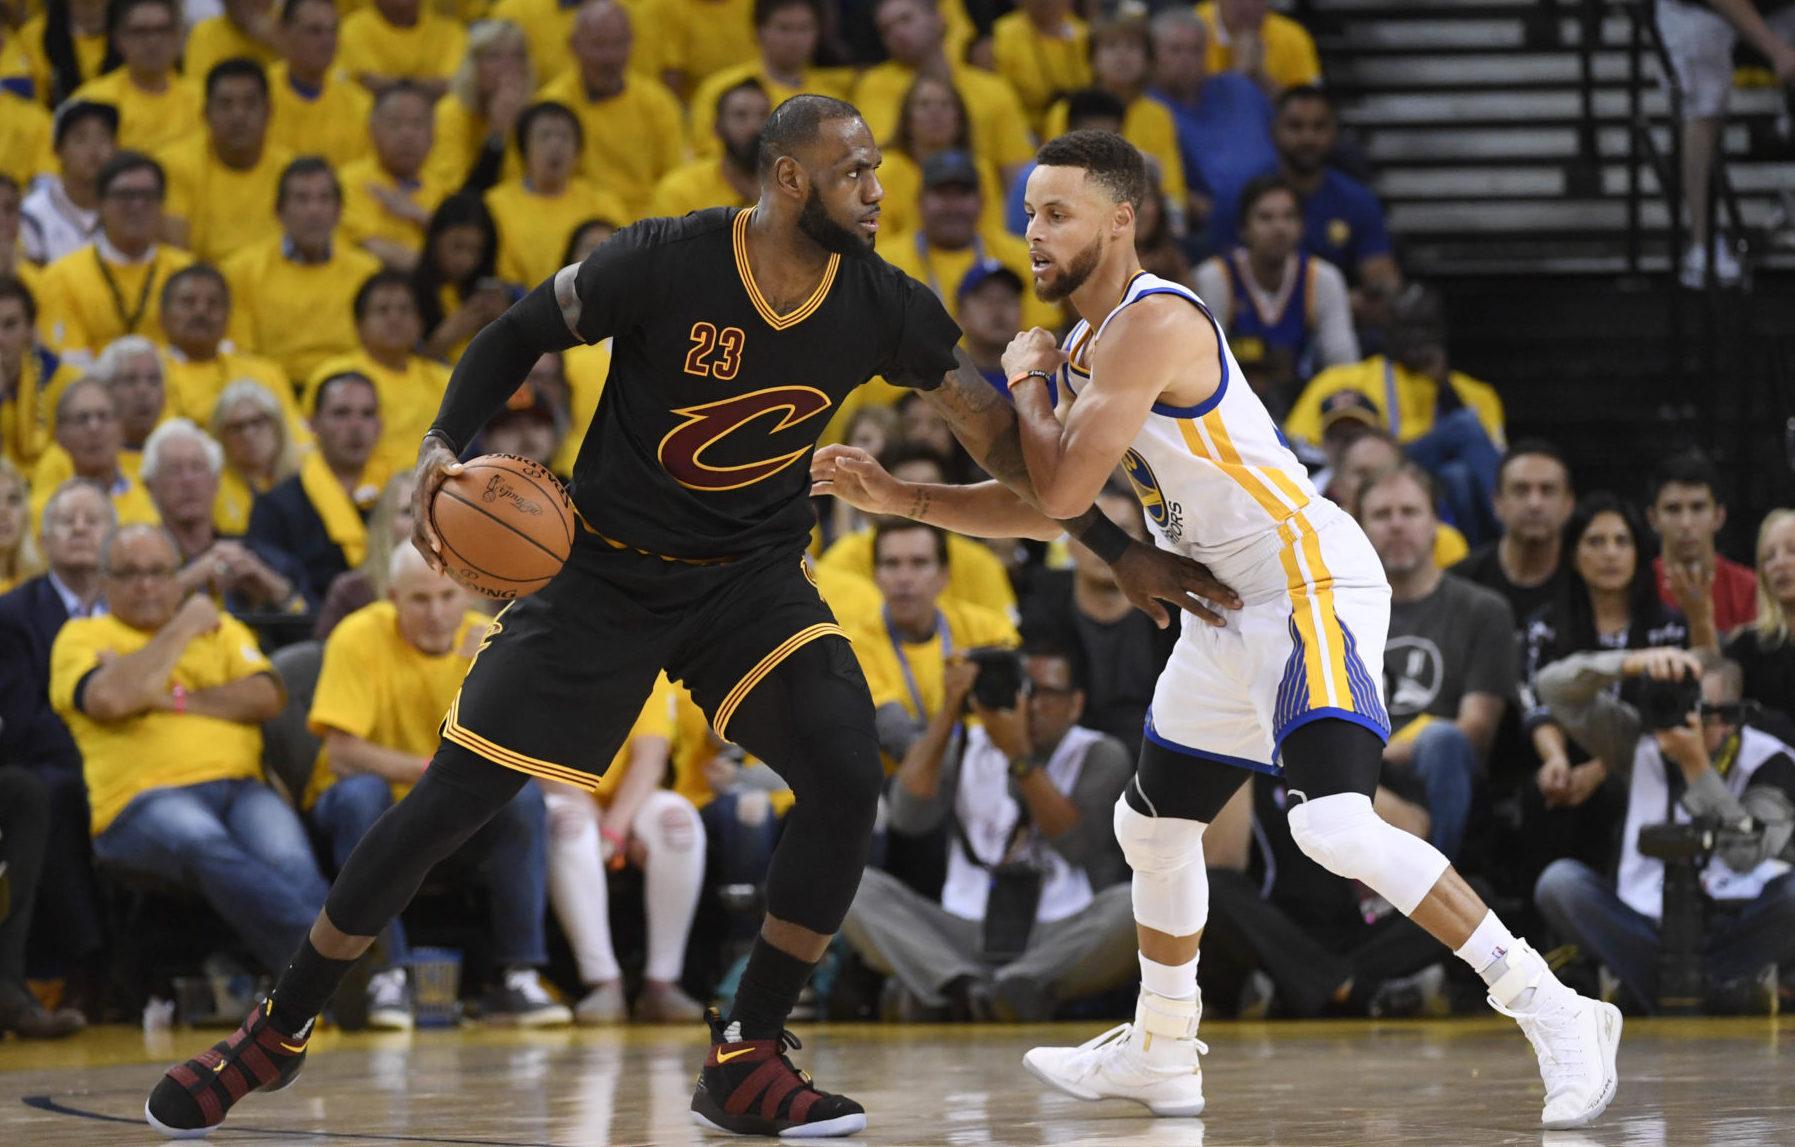 NBA All-Star mock draft: Who should Steph and LeBron select?